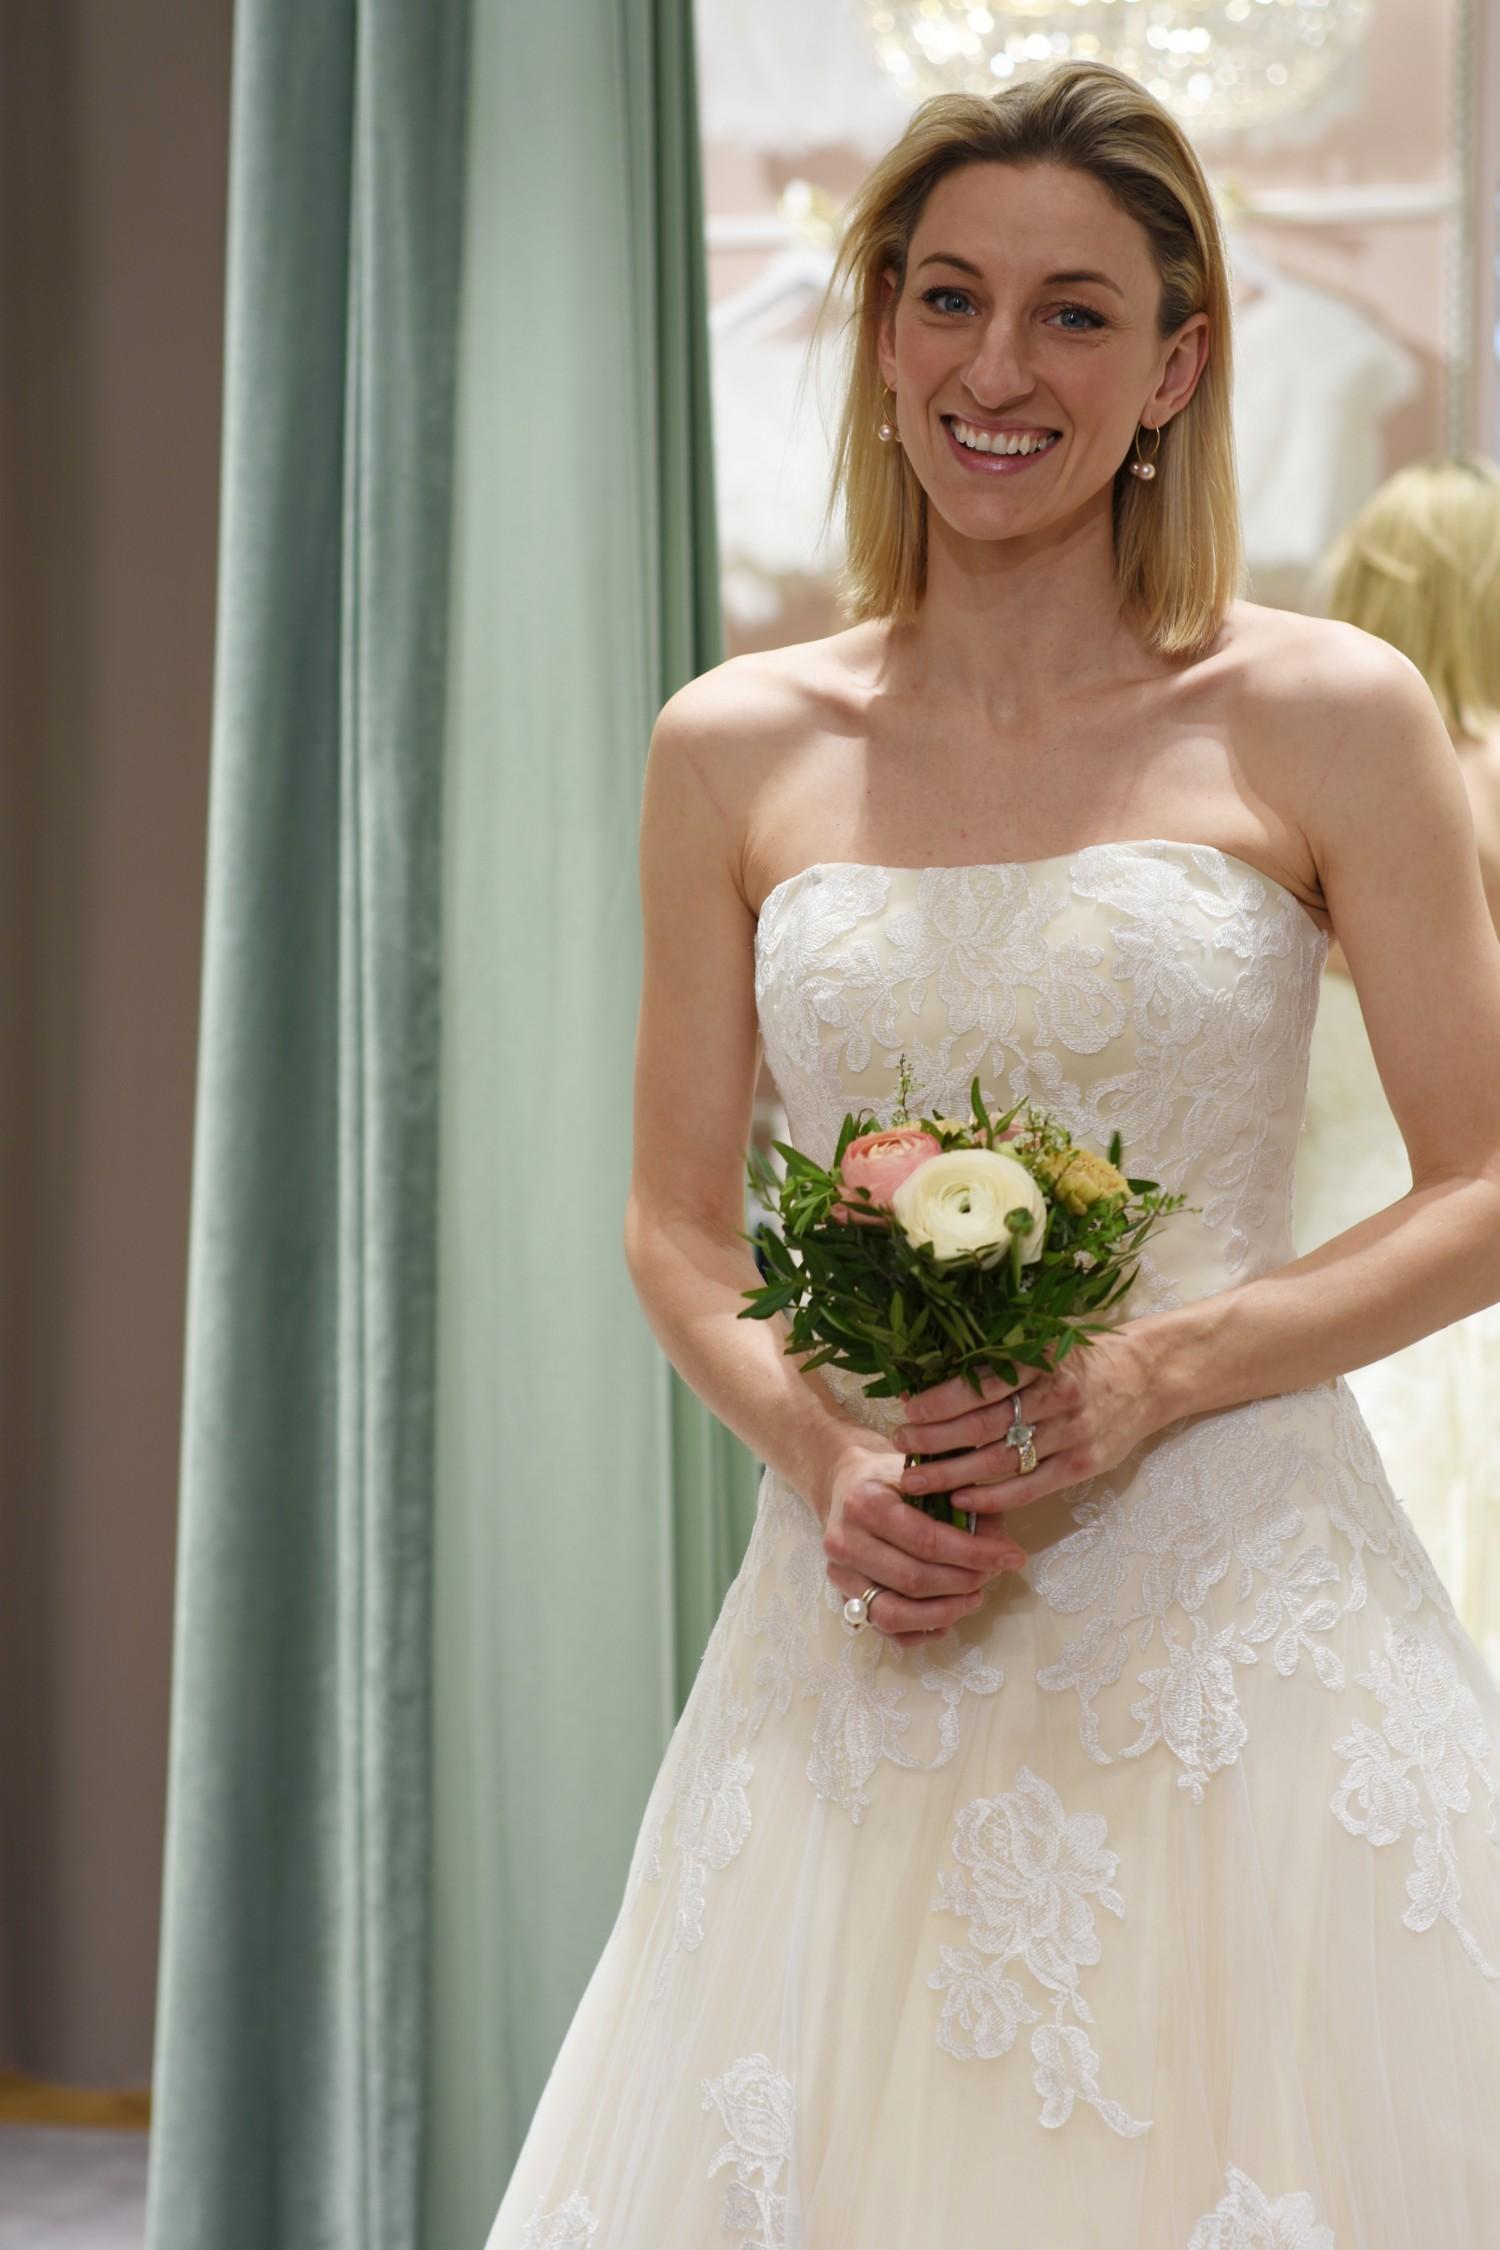 lilly-brudekjoler-annemette-voss-34